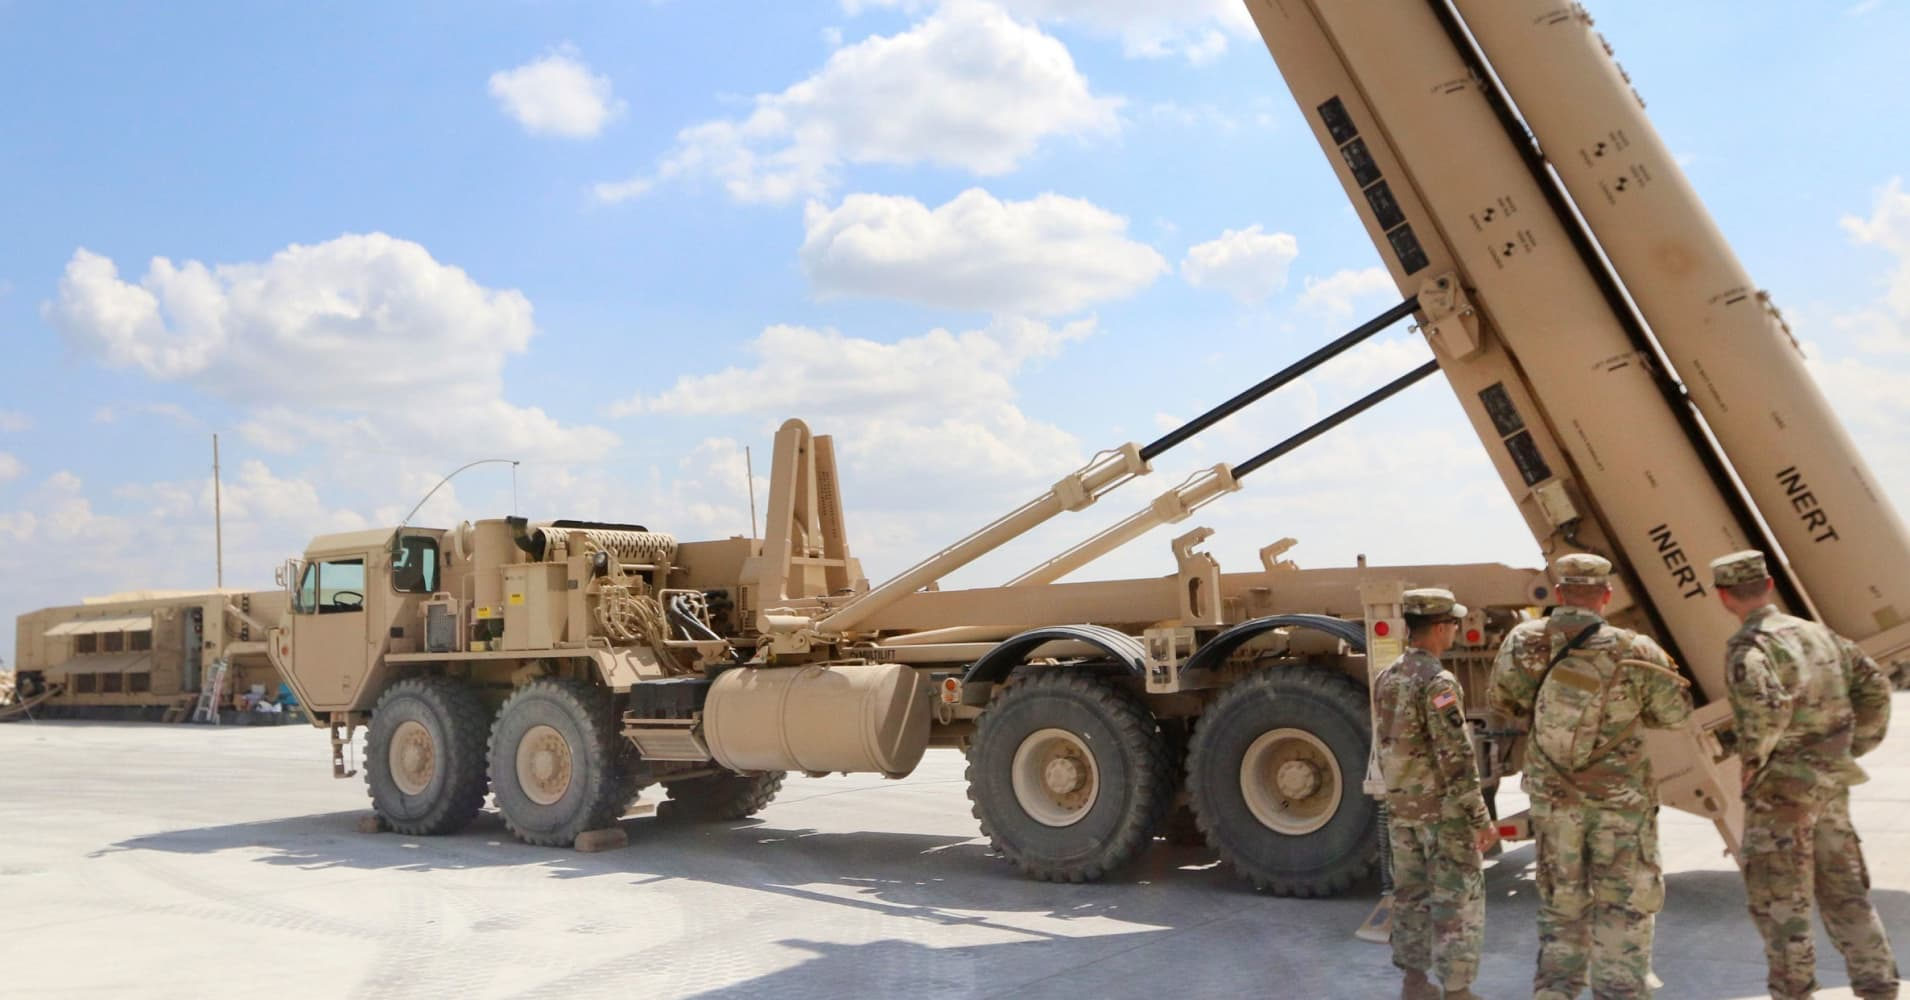 Pentagon awards Lockheed Martin nearly $1 billion for Saudi missile system deal